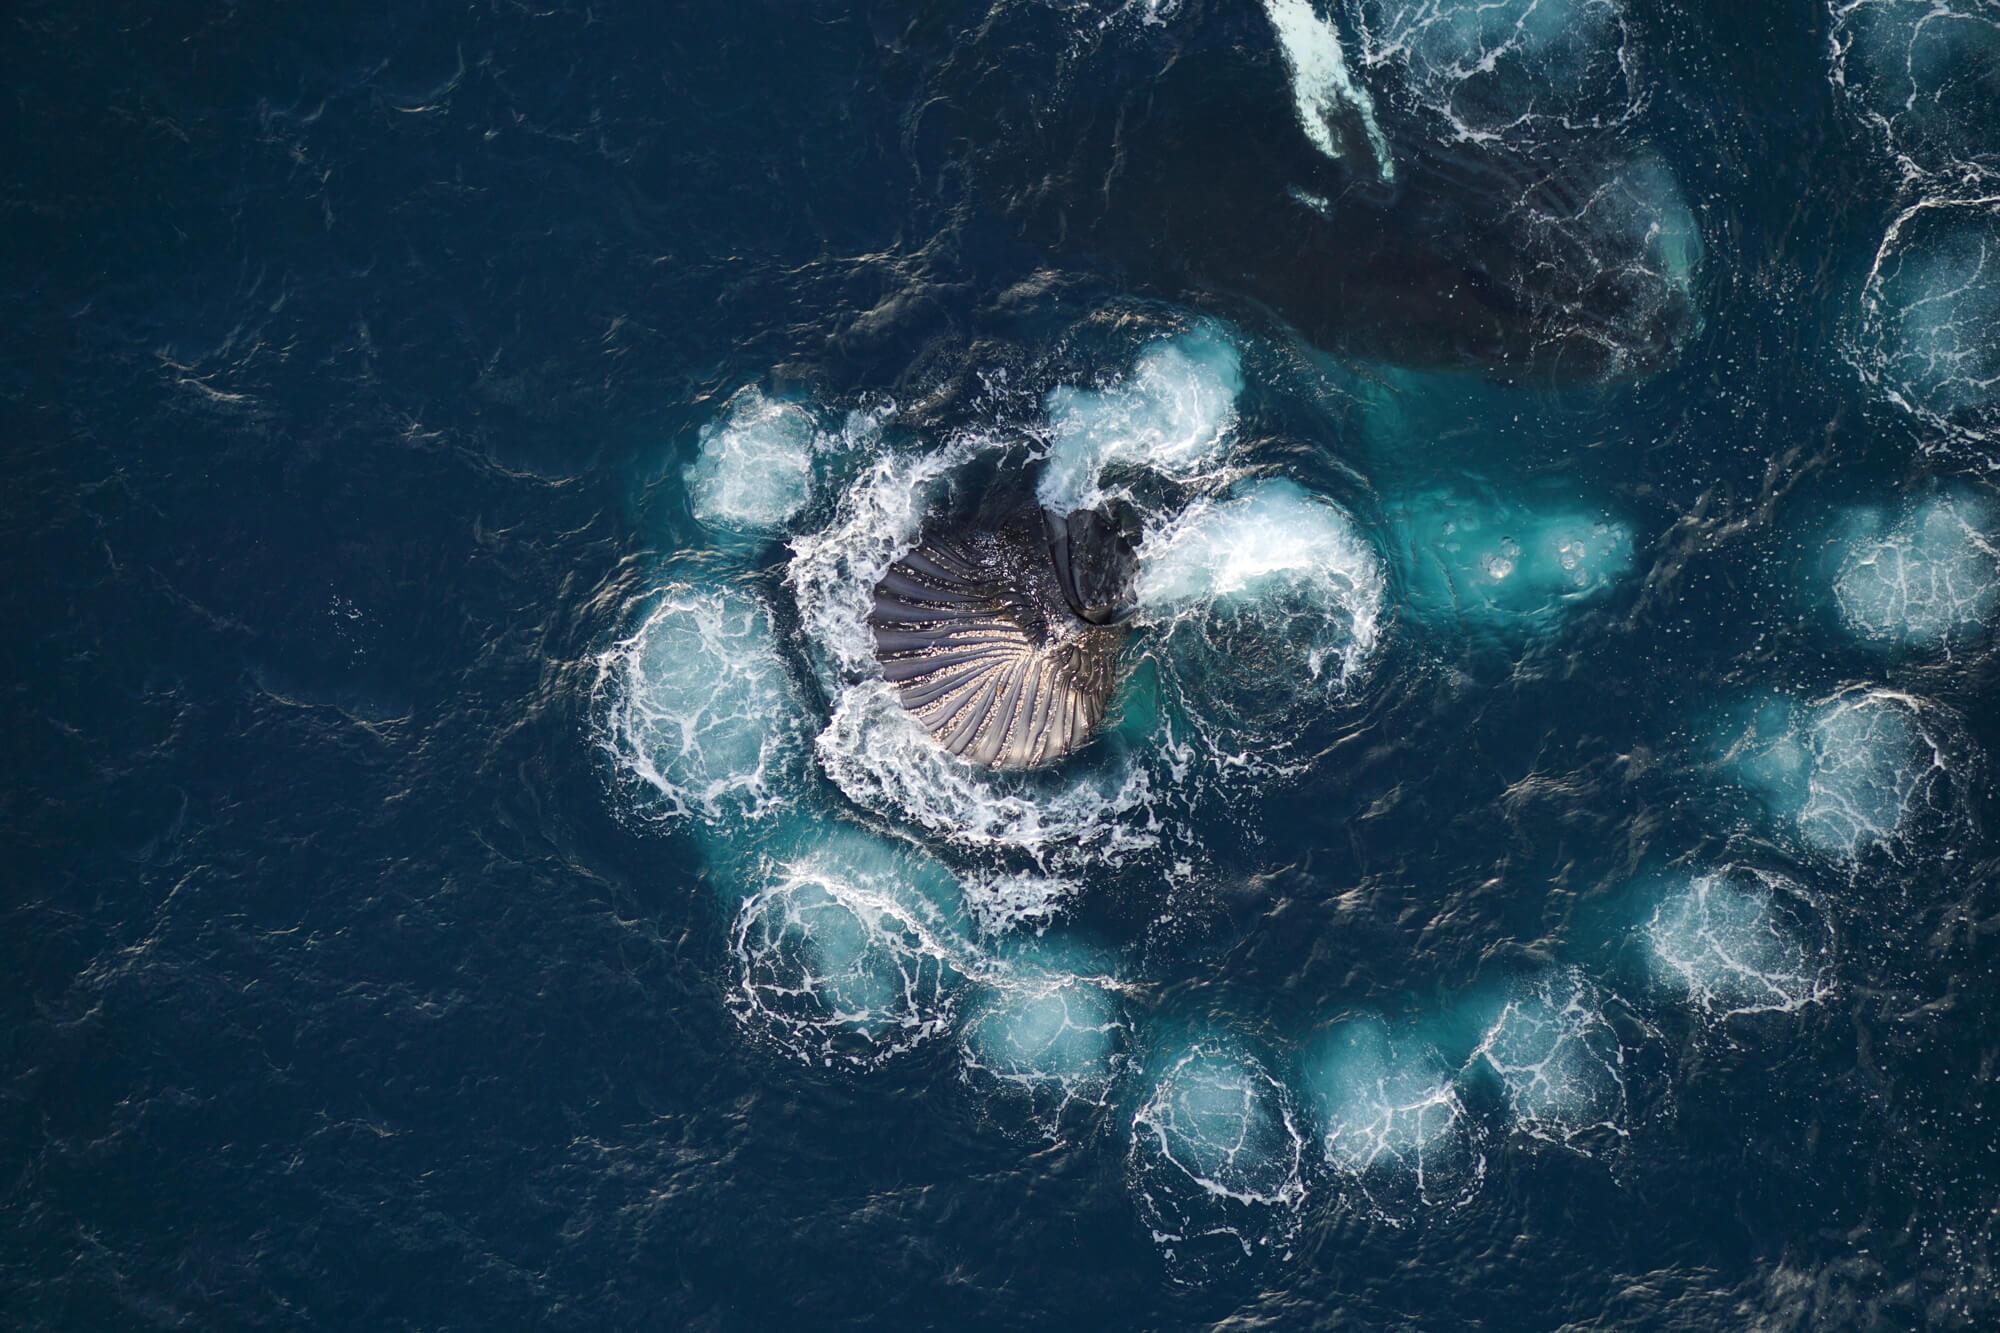 spirale de bulles